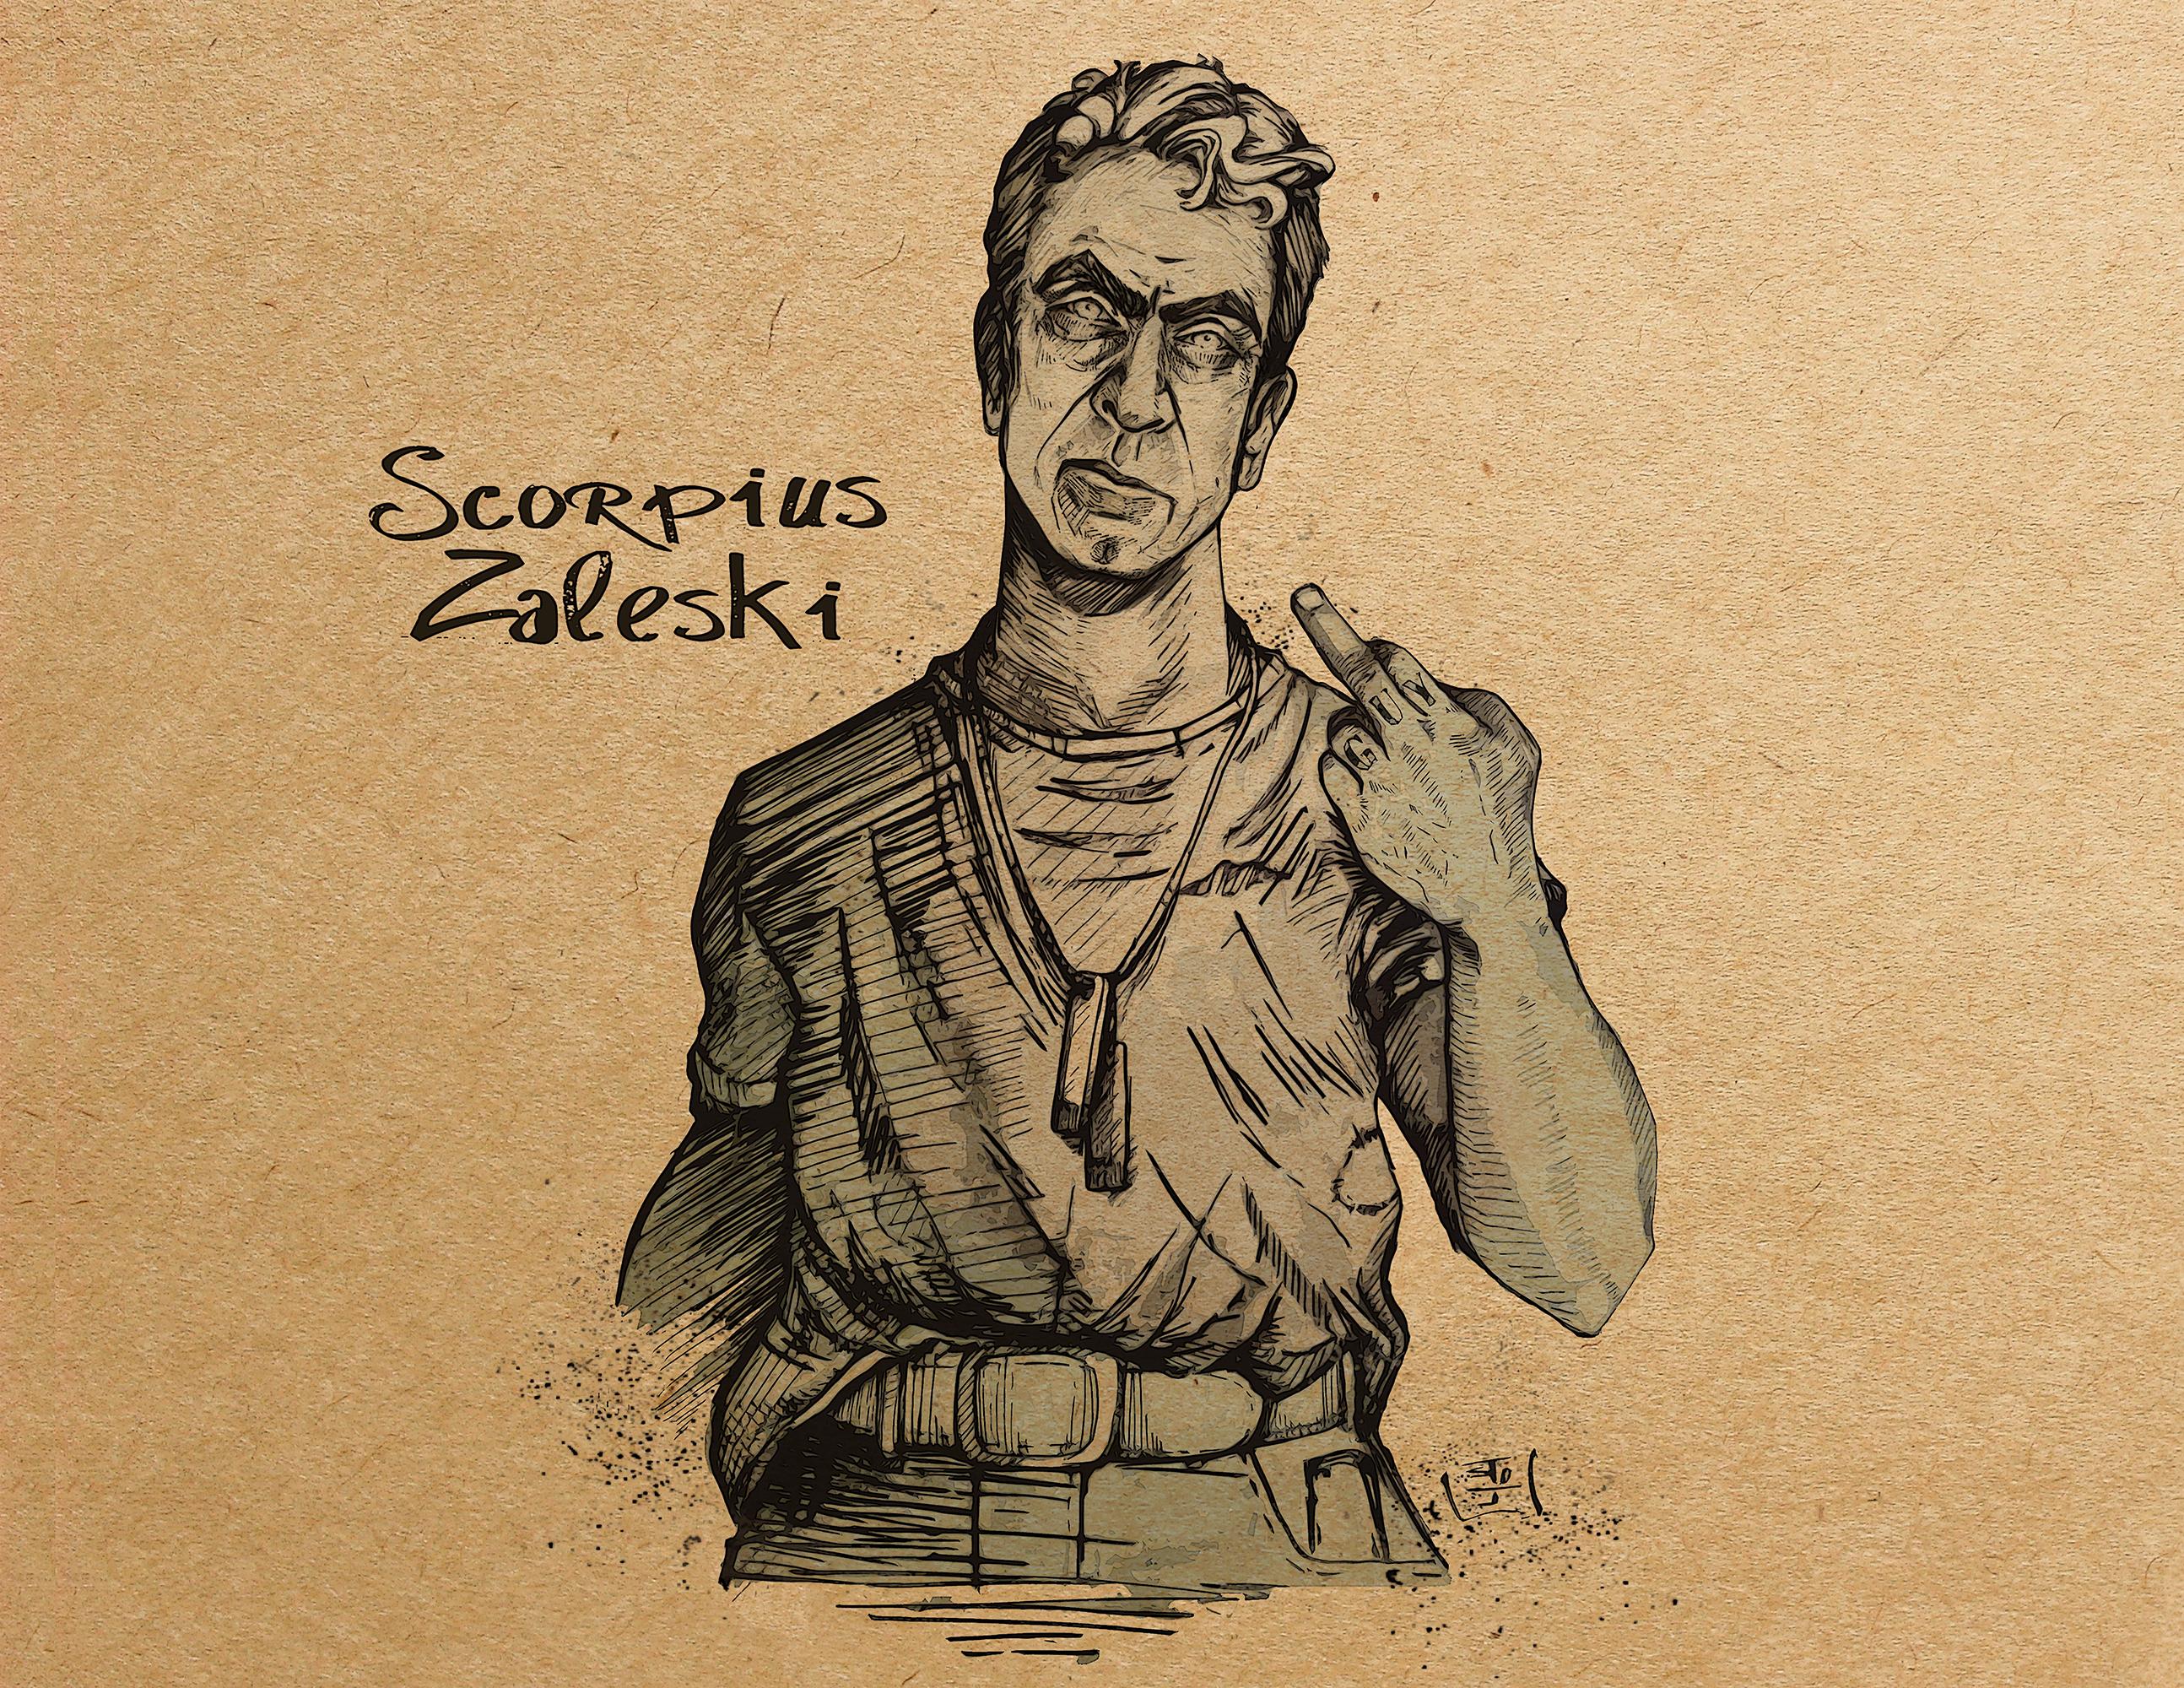 Scorpius Zaleski